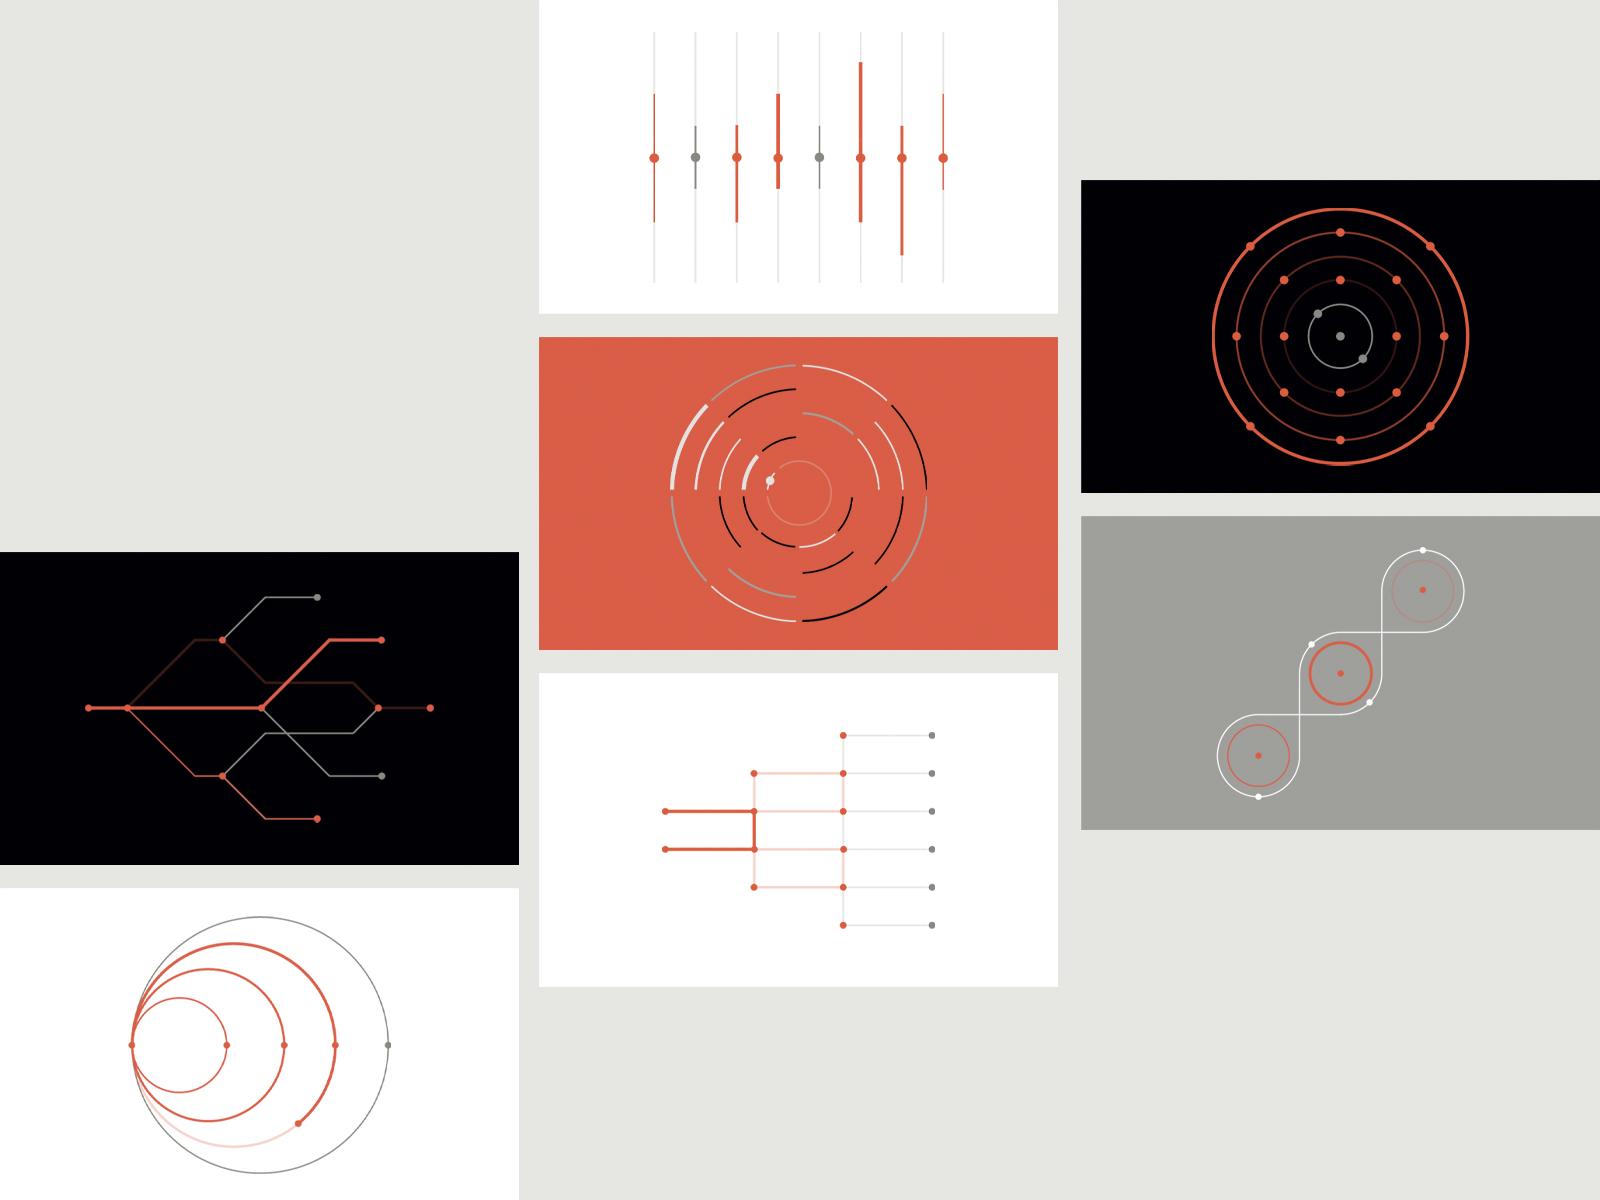 visualization of complex data